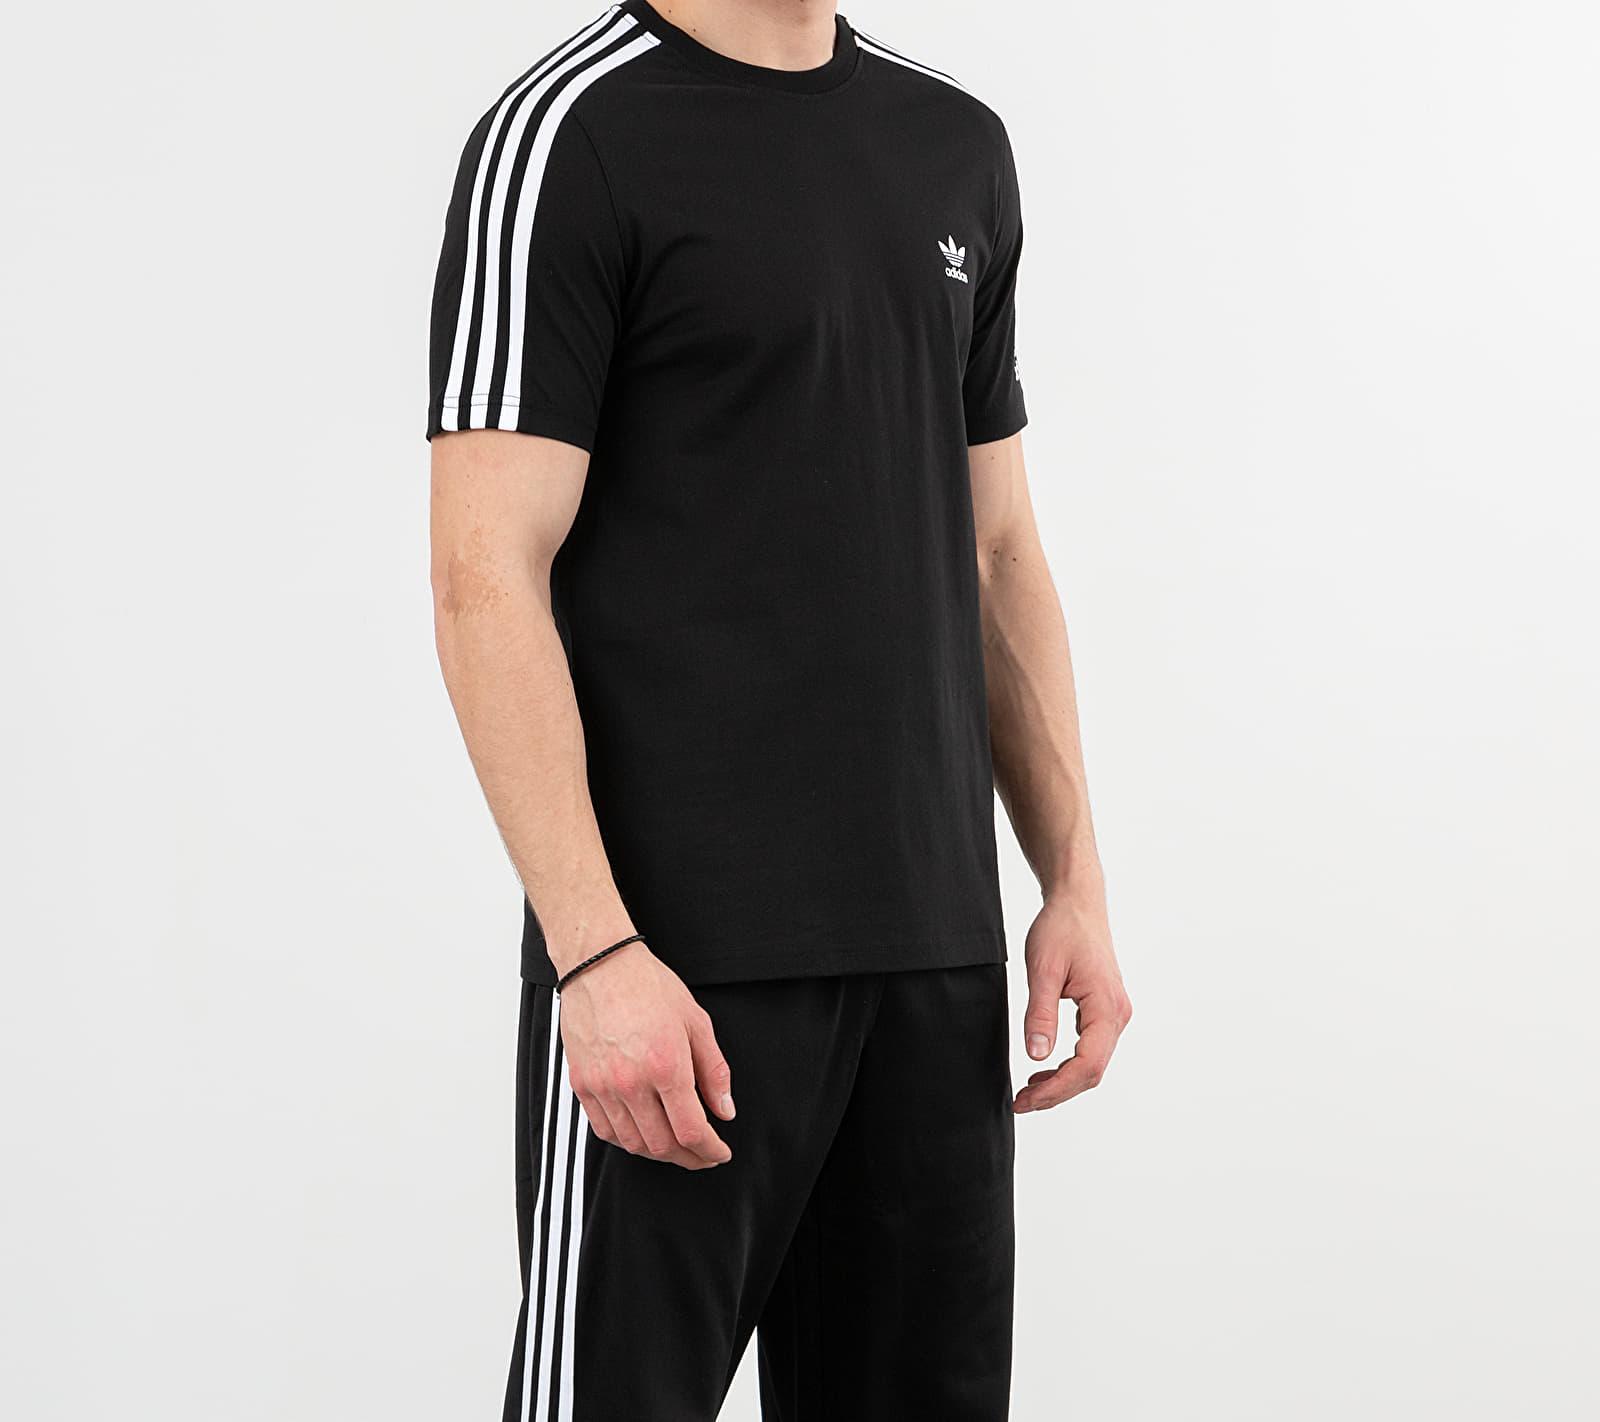 adidas Tech Tee Black L